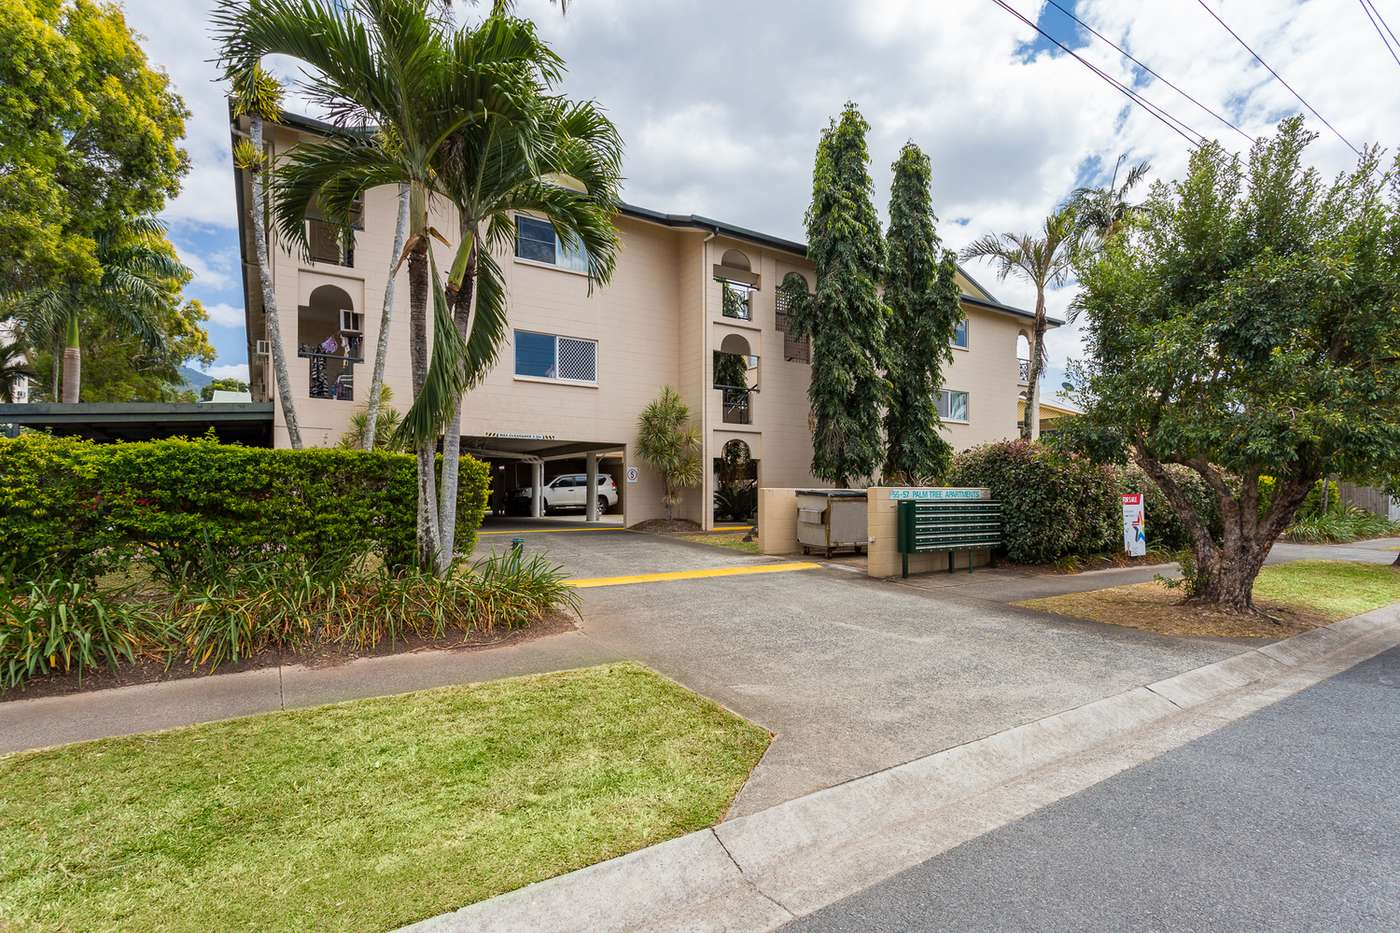 Main view of Homely unit listing, 37/55-57 McCormack Street, Manunda, QLD 4870